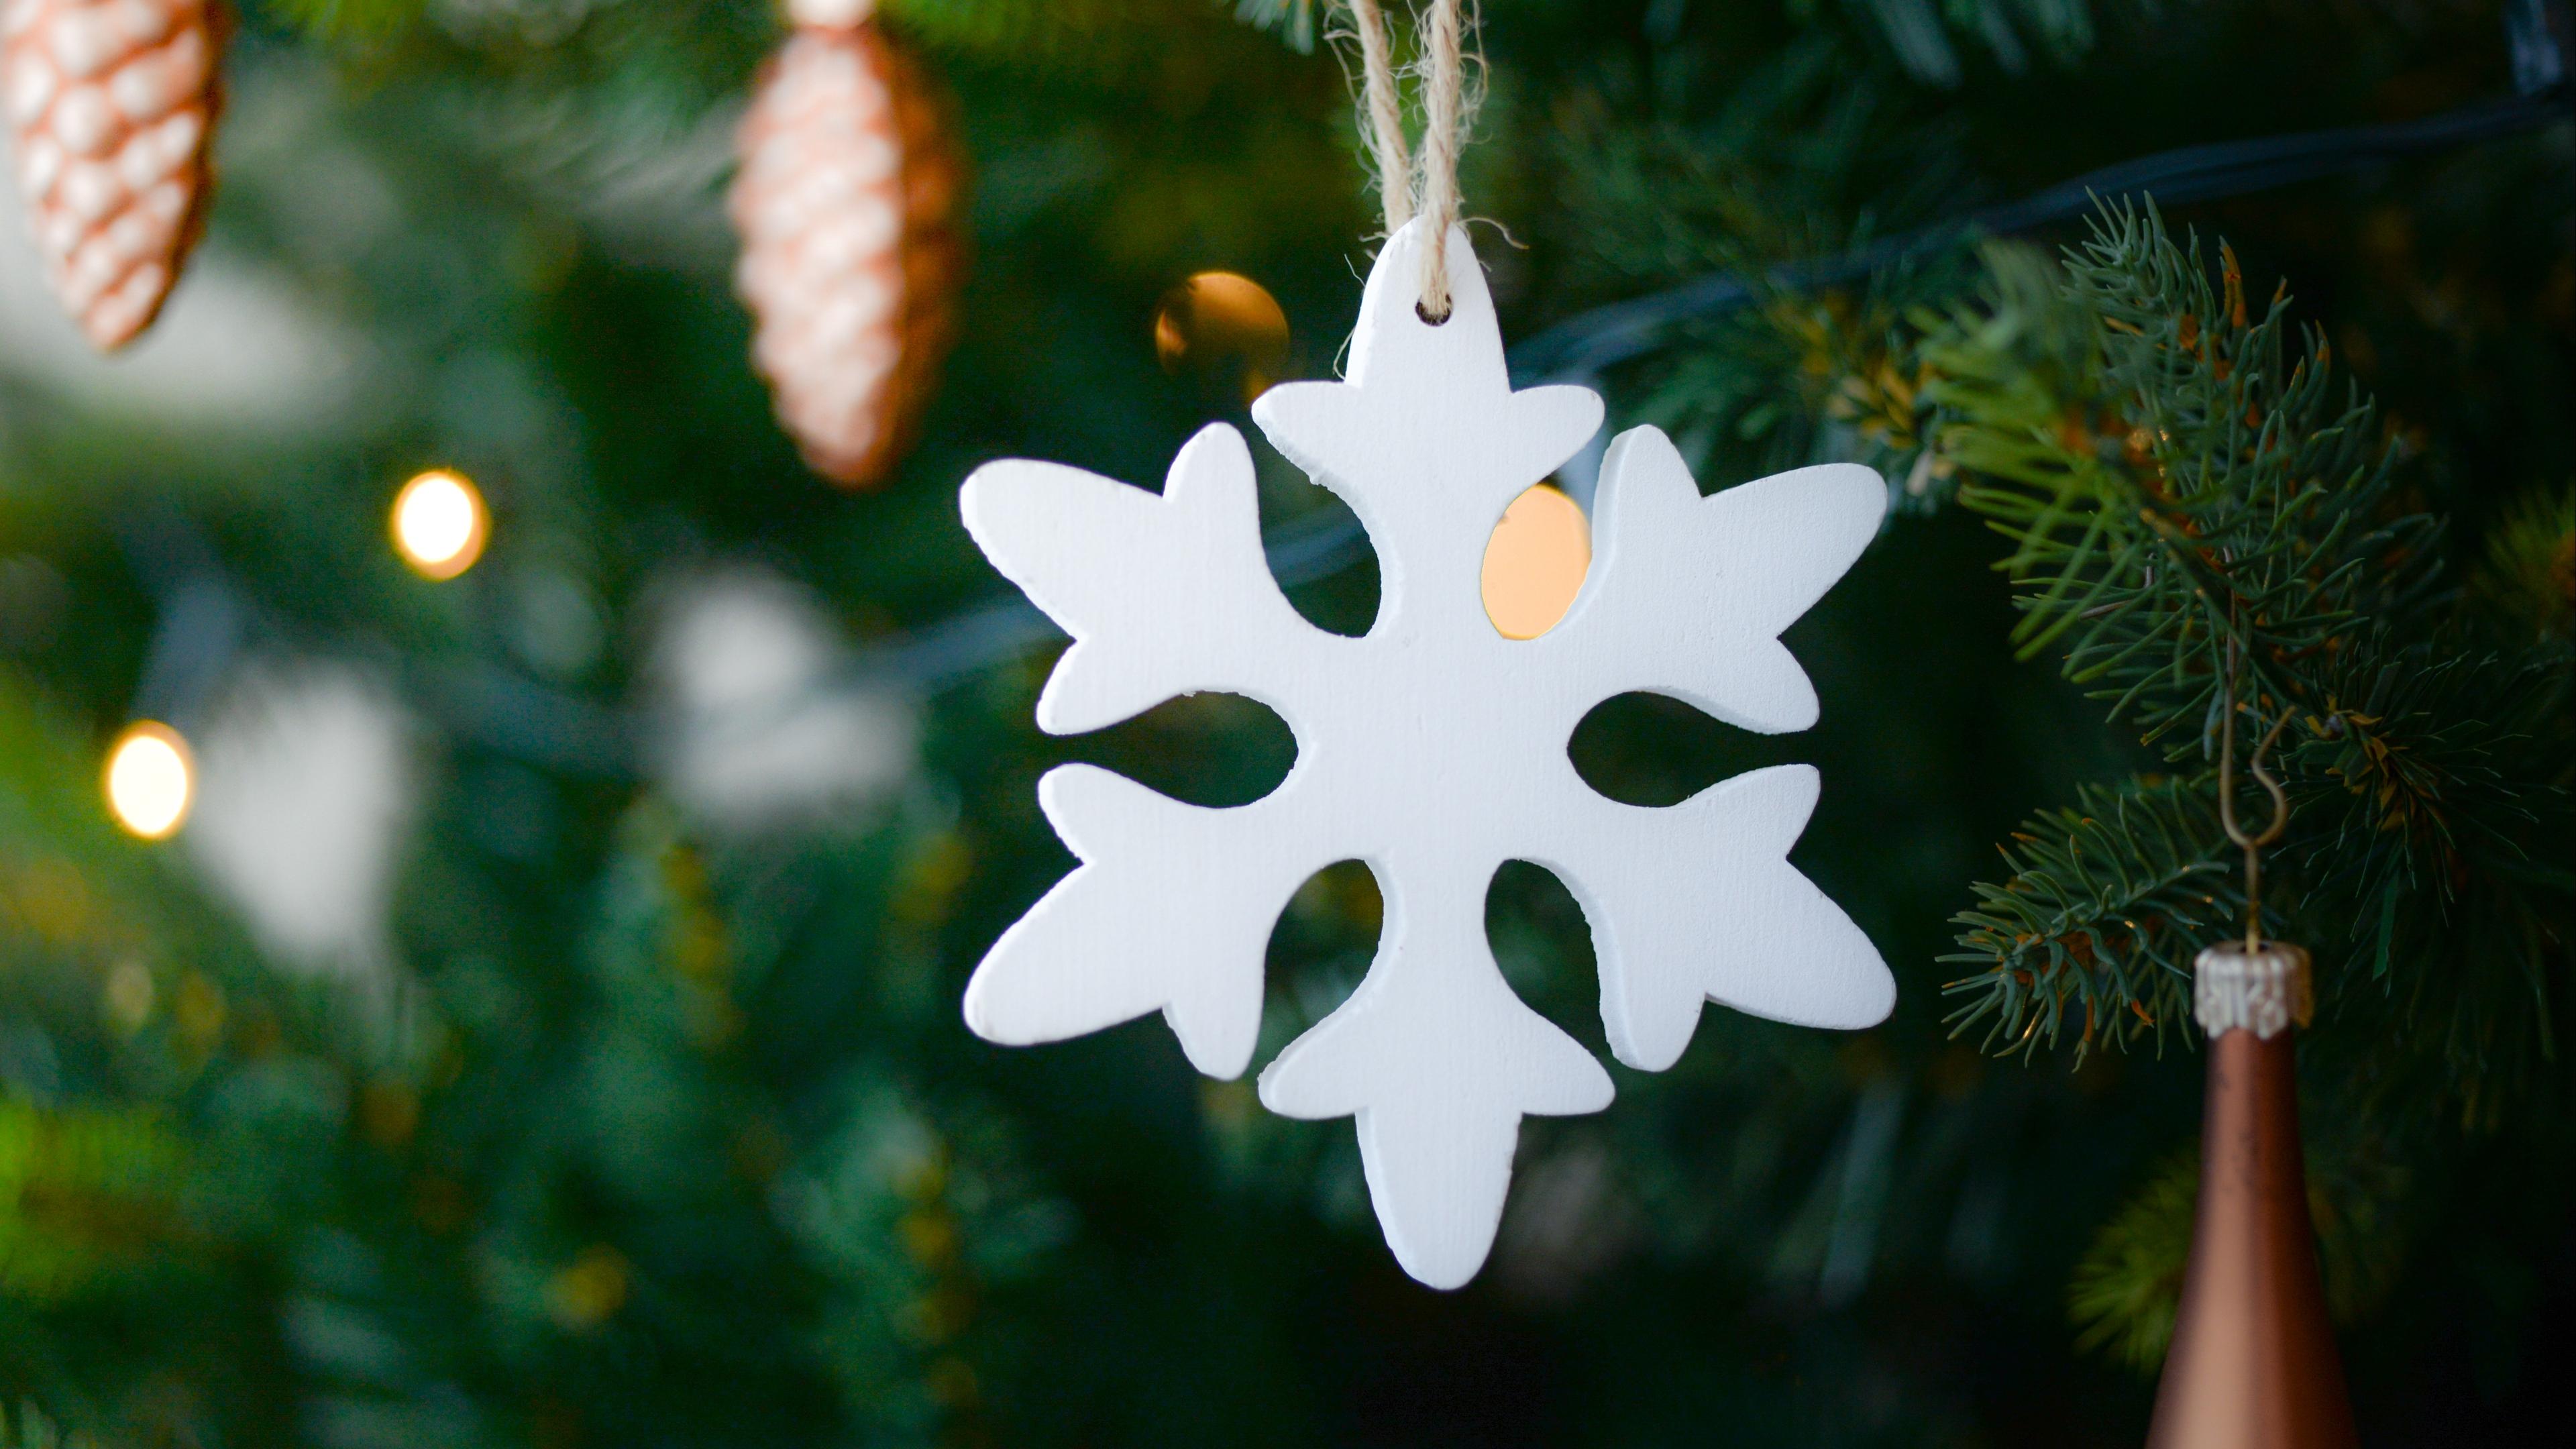 snowflake christmas tree decoration 4k 1538344606 - snowflake, christmas tree, decoration 4k - snowflake, decoration, christmas tree